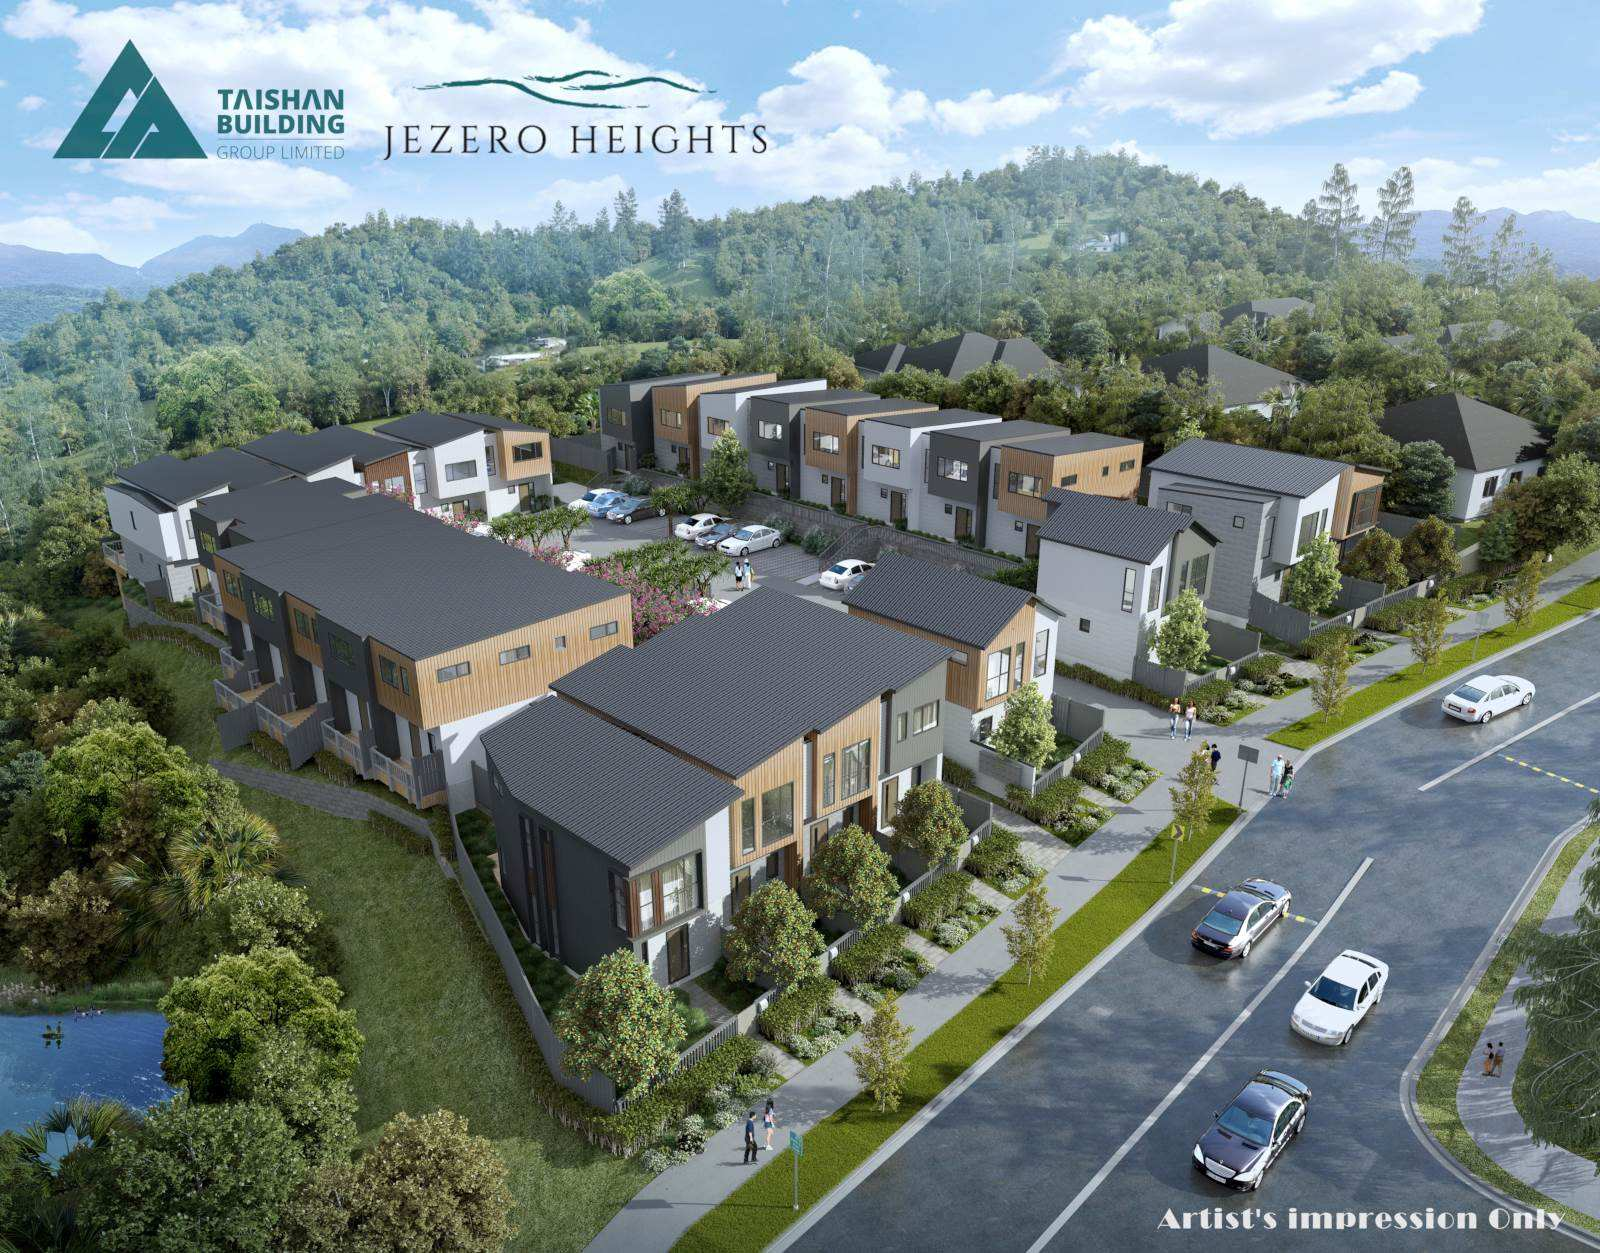 Massey 2房 Jezero Heights性价比新房 注重品质与生活体验 地段一流 近高速 多面积可选! Jezero Heights - Affordable Freehold Townhouses